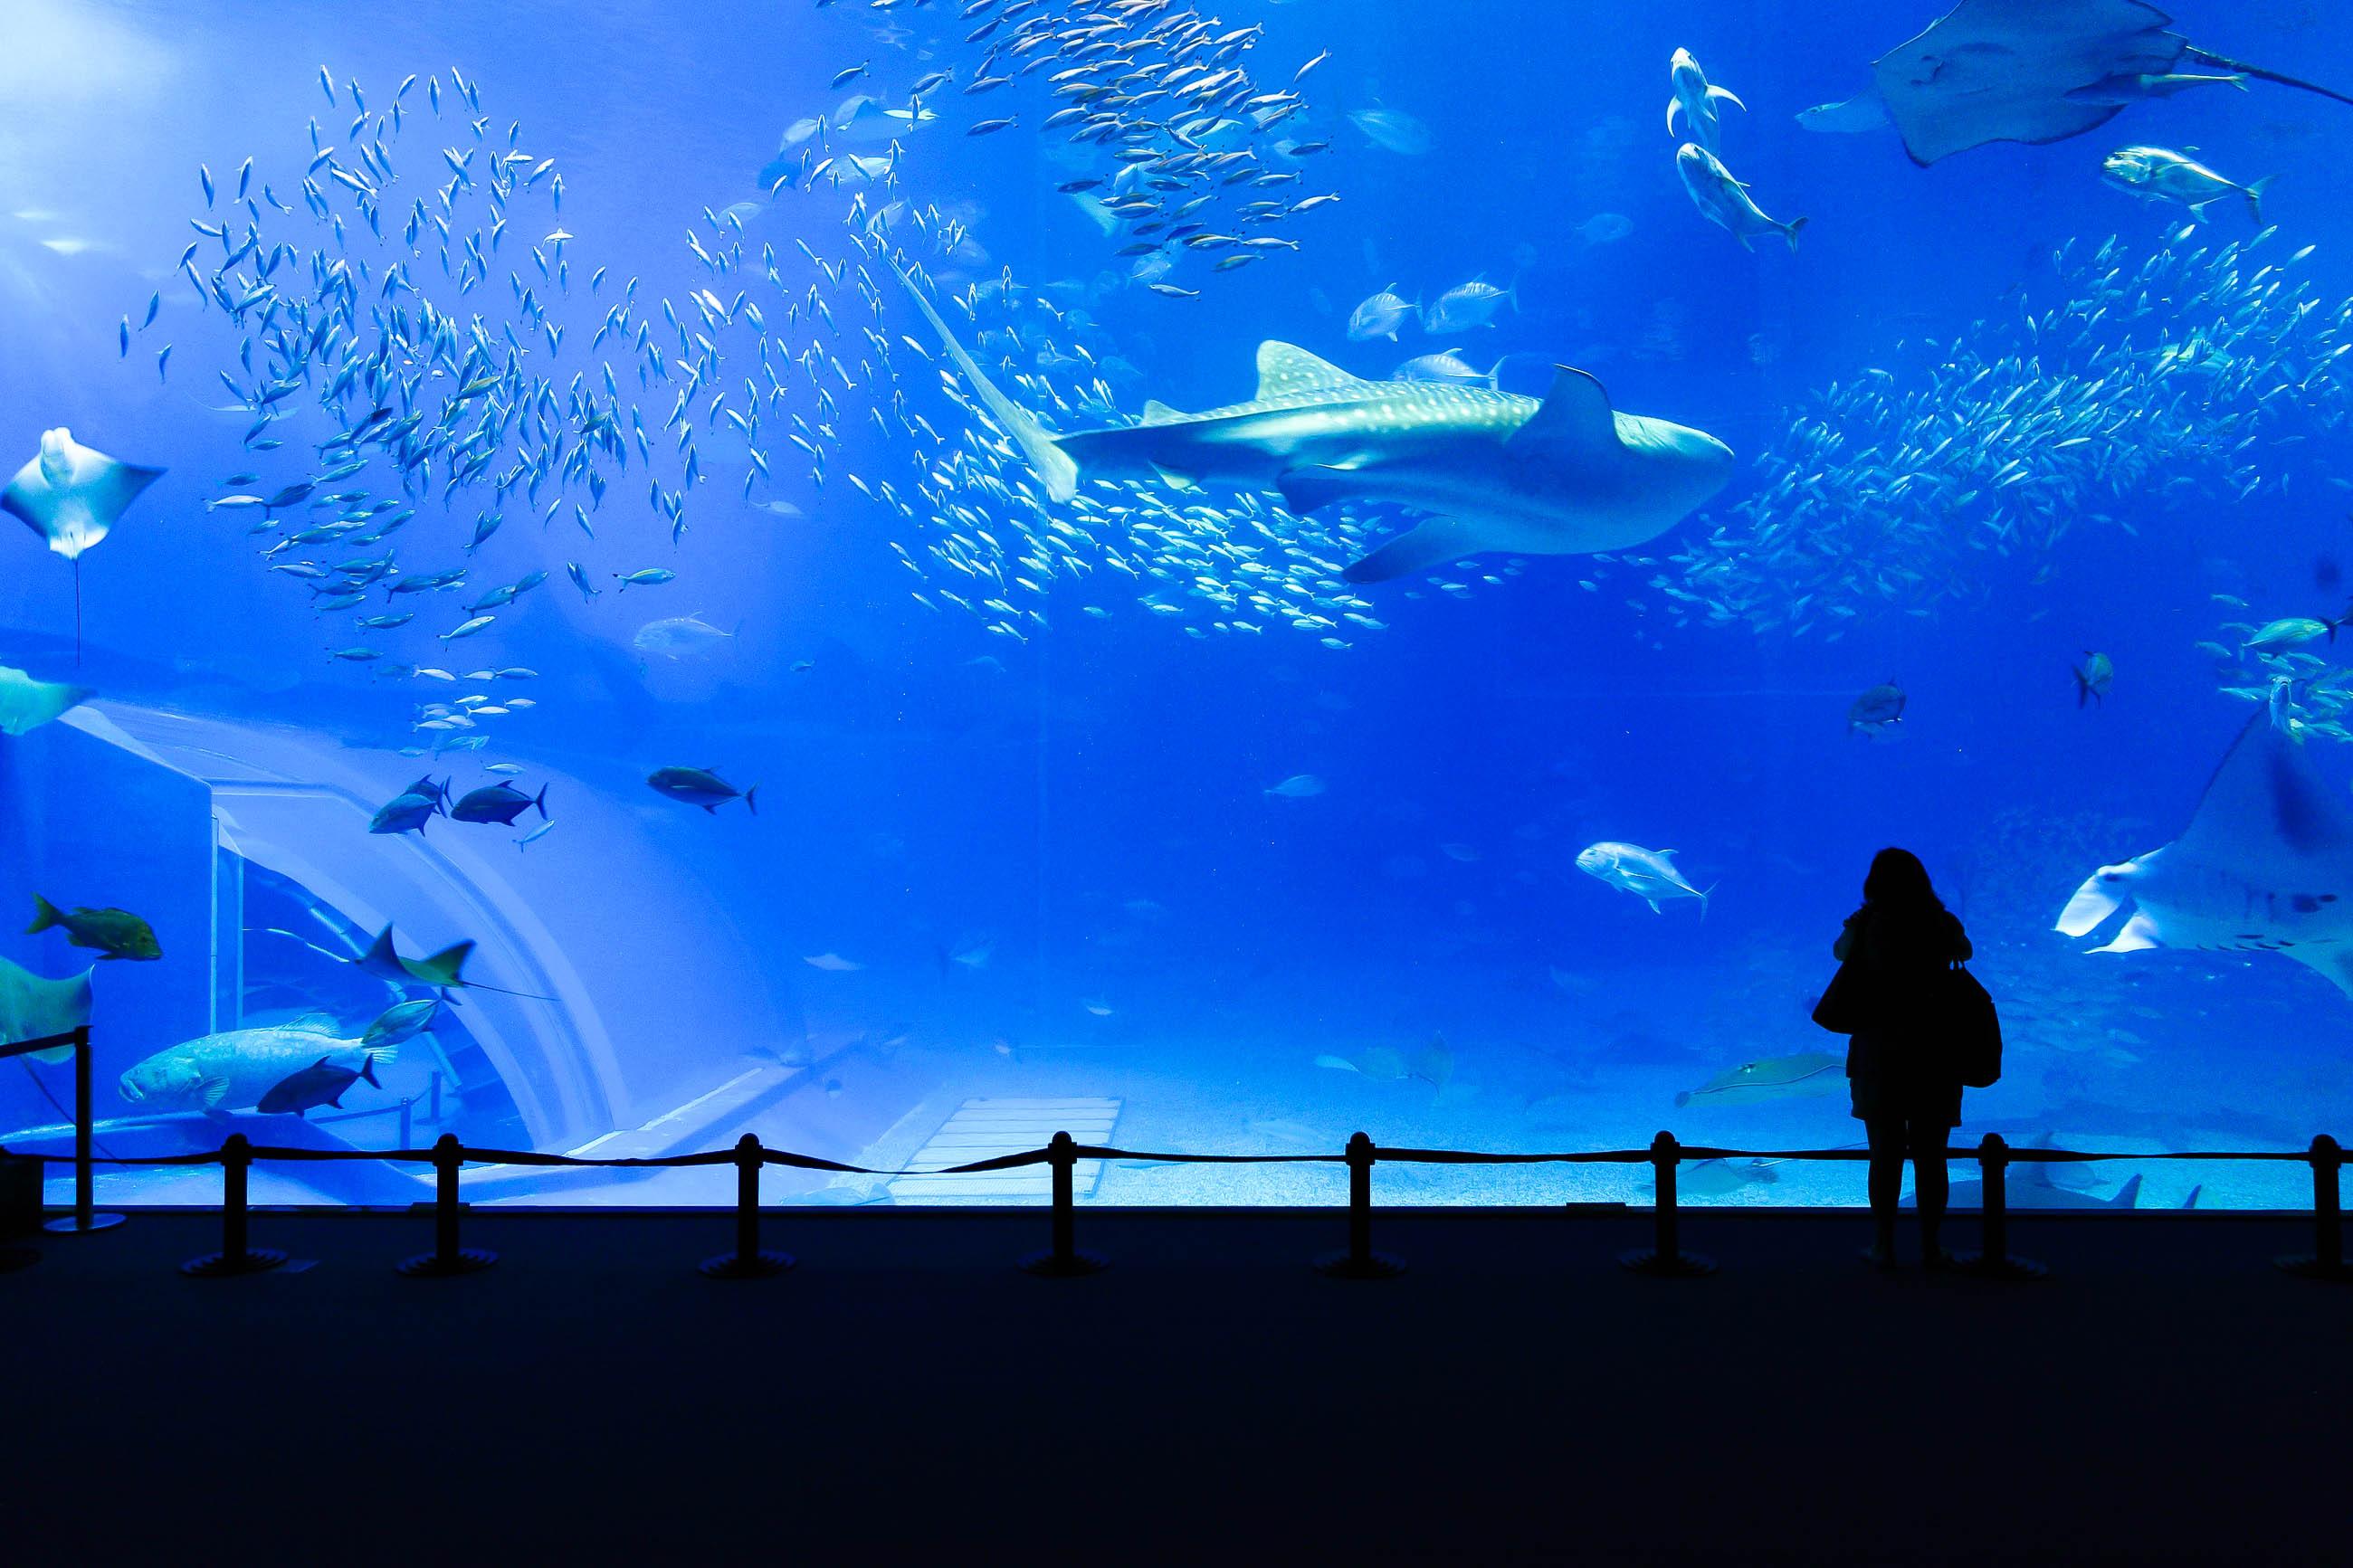 Okinawa churaumi aquarium japan franks travelbox for Salzwasser aquarium